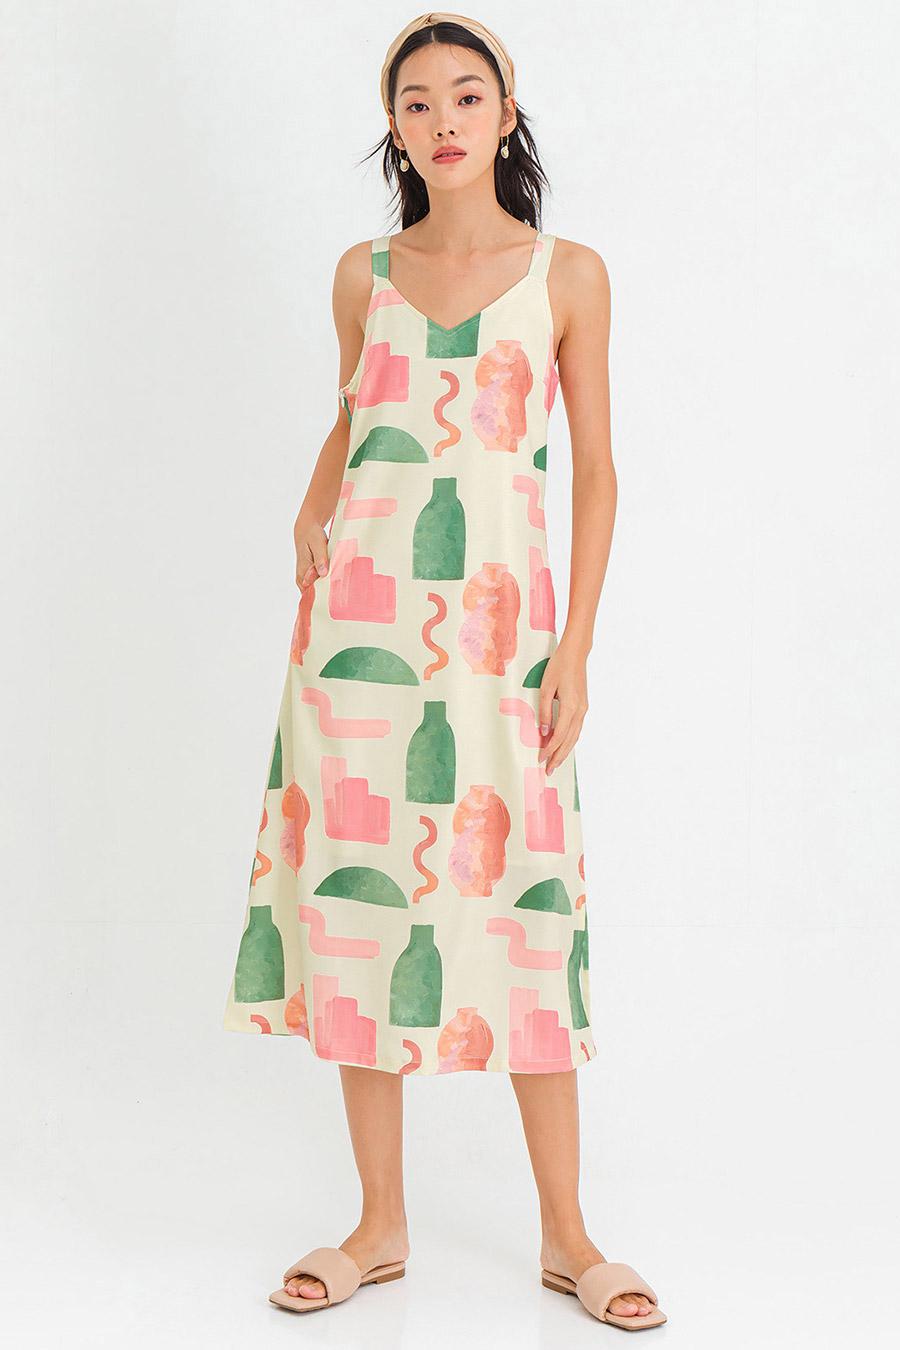 GELLAR DRESS - VALLEY [BY MODPARADE]